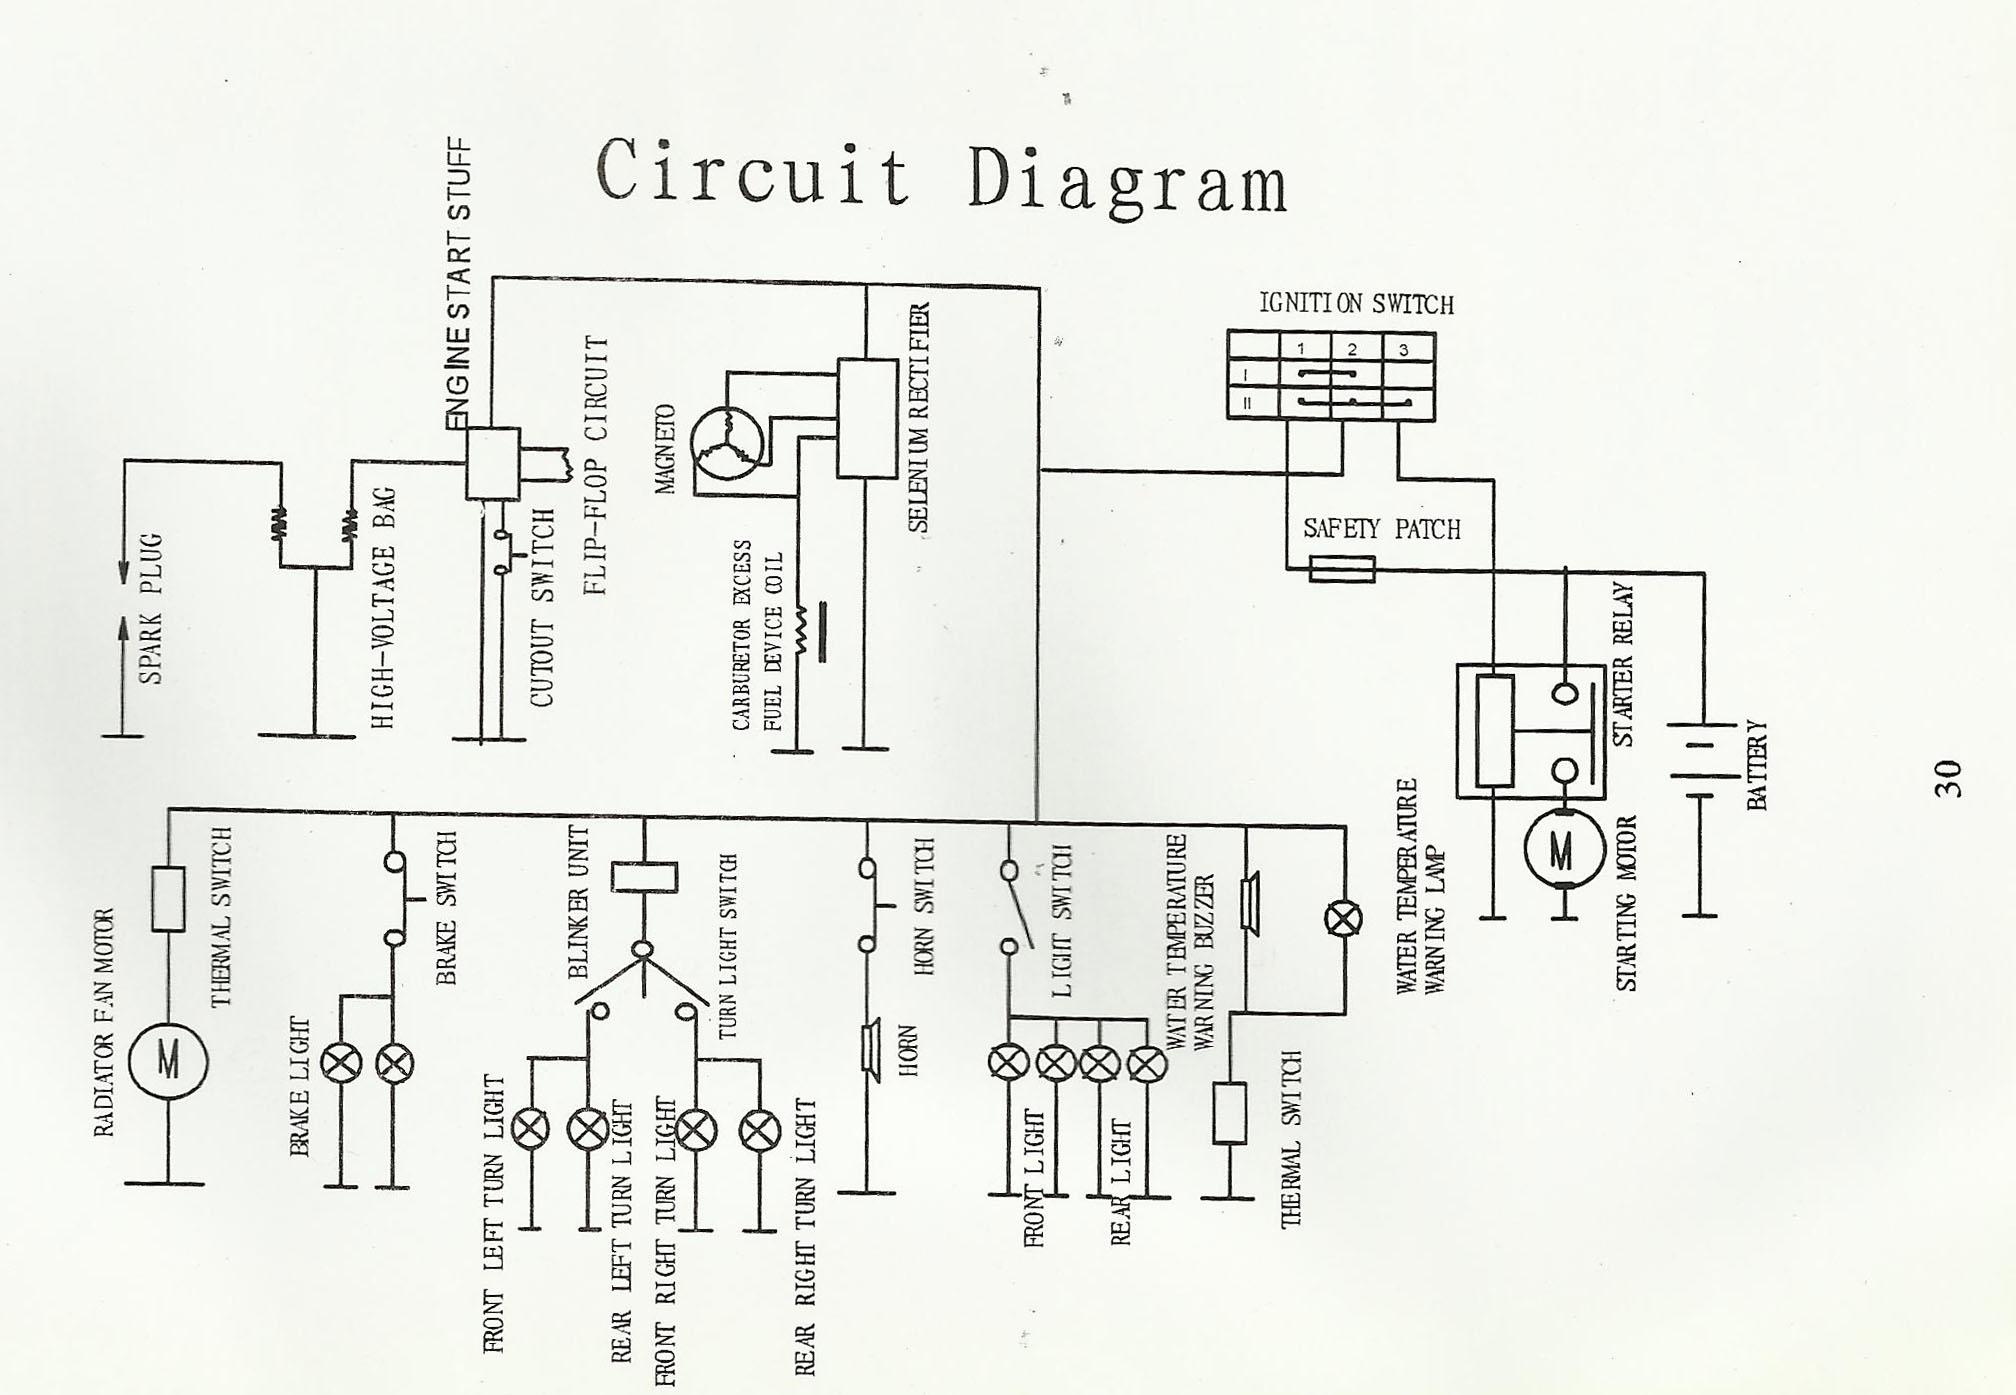 Gio Atv Wiring Diagram - 2015 Gmc Savana Wiring Diagram -  code-03.honda-accordd.waystar.fr [ 1395 x 2016 Pixel ]